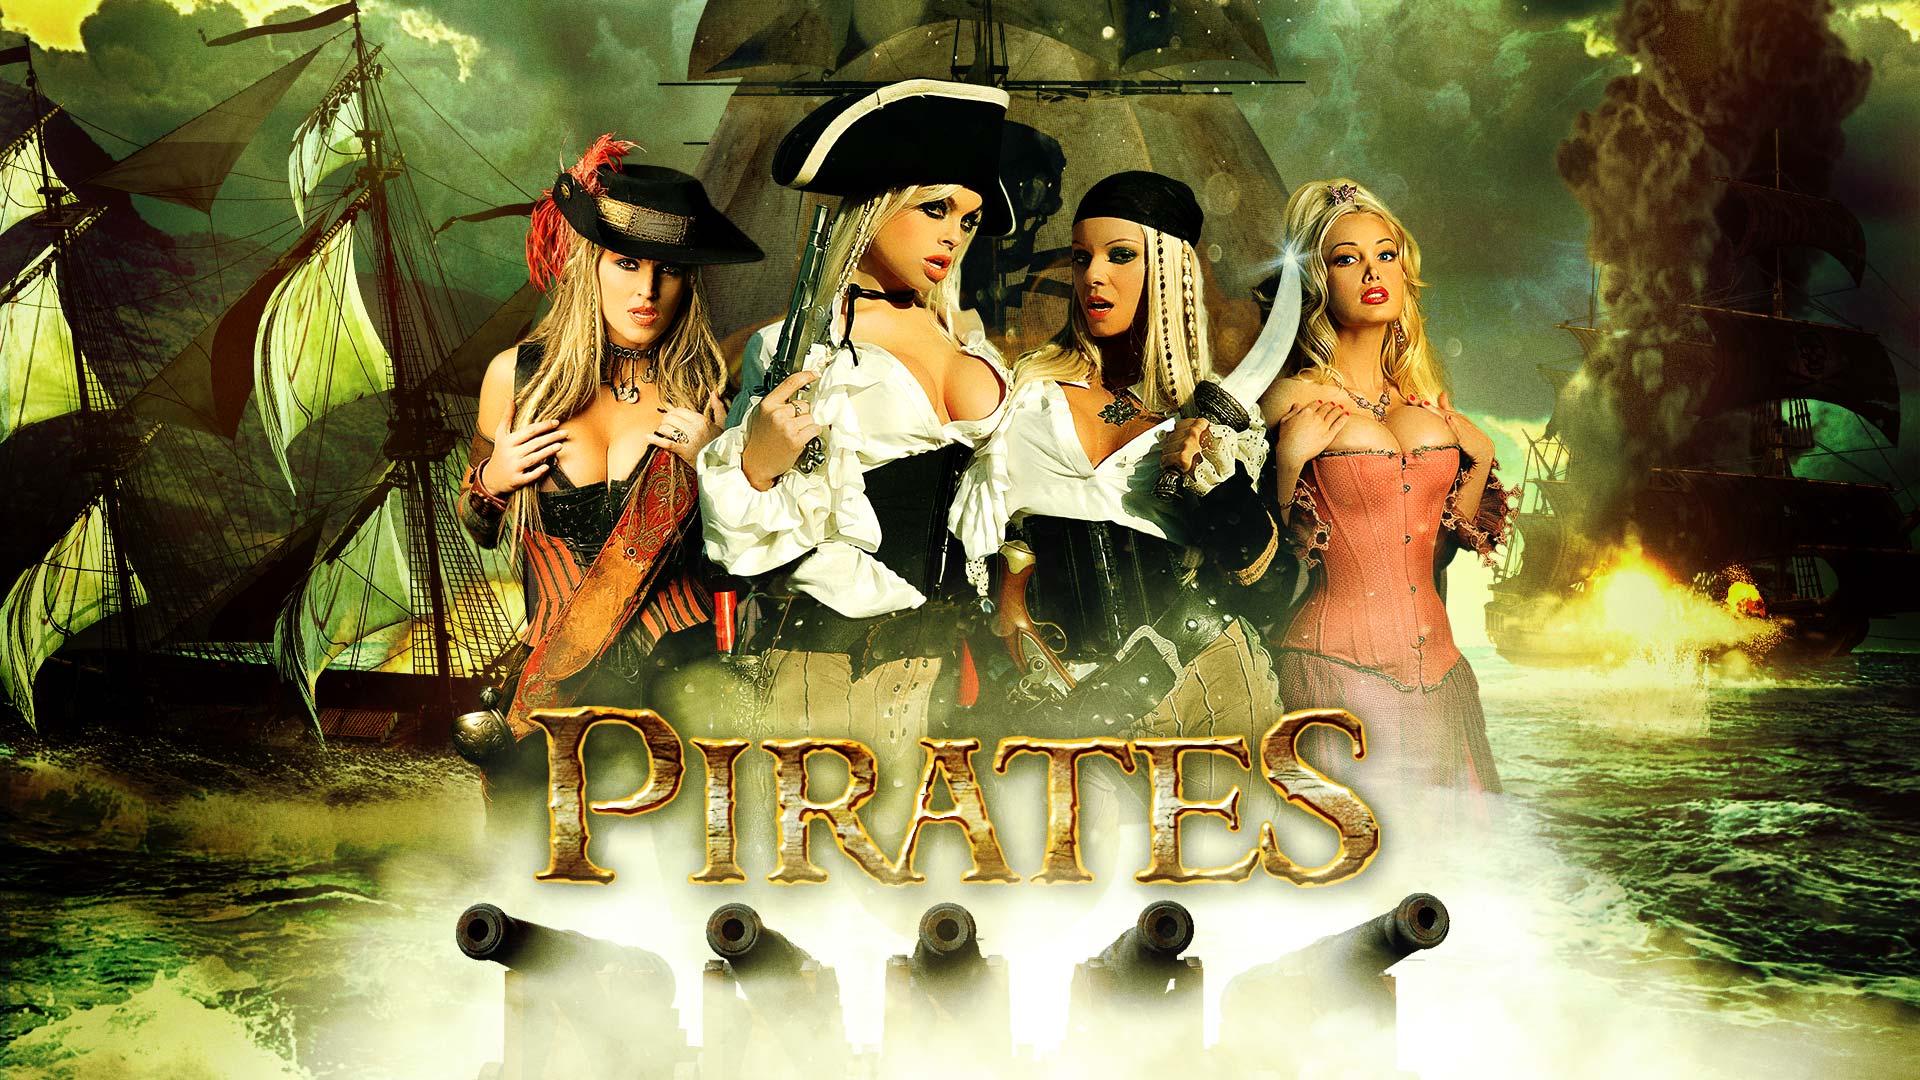 Digital Playground Full Fledge Movies Pirates